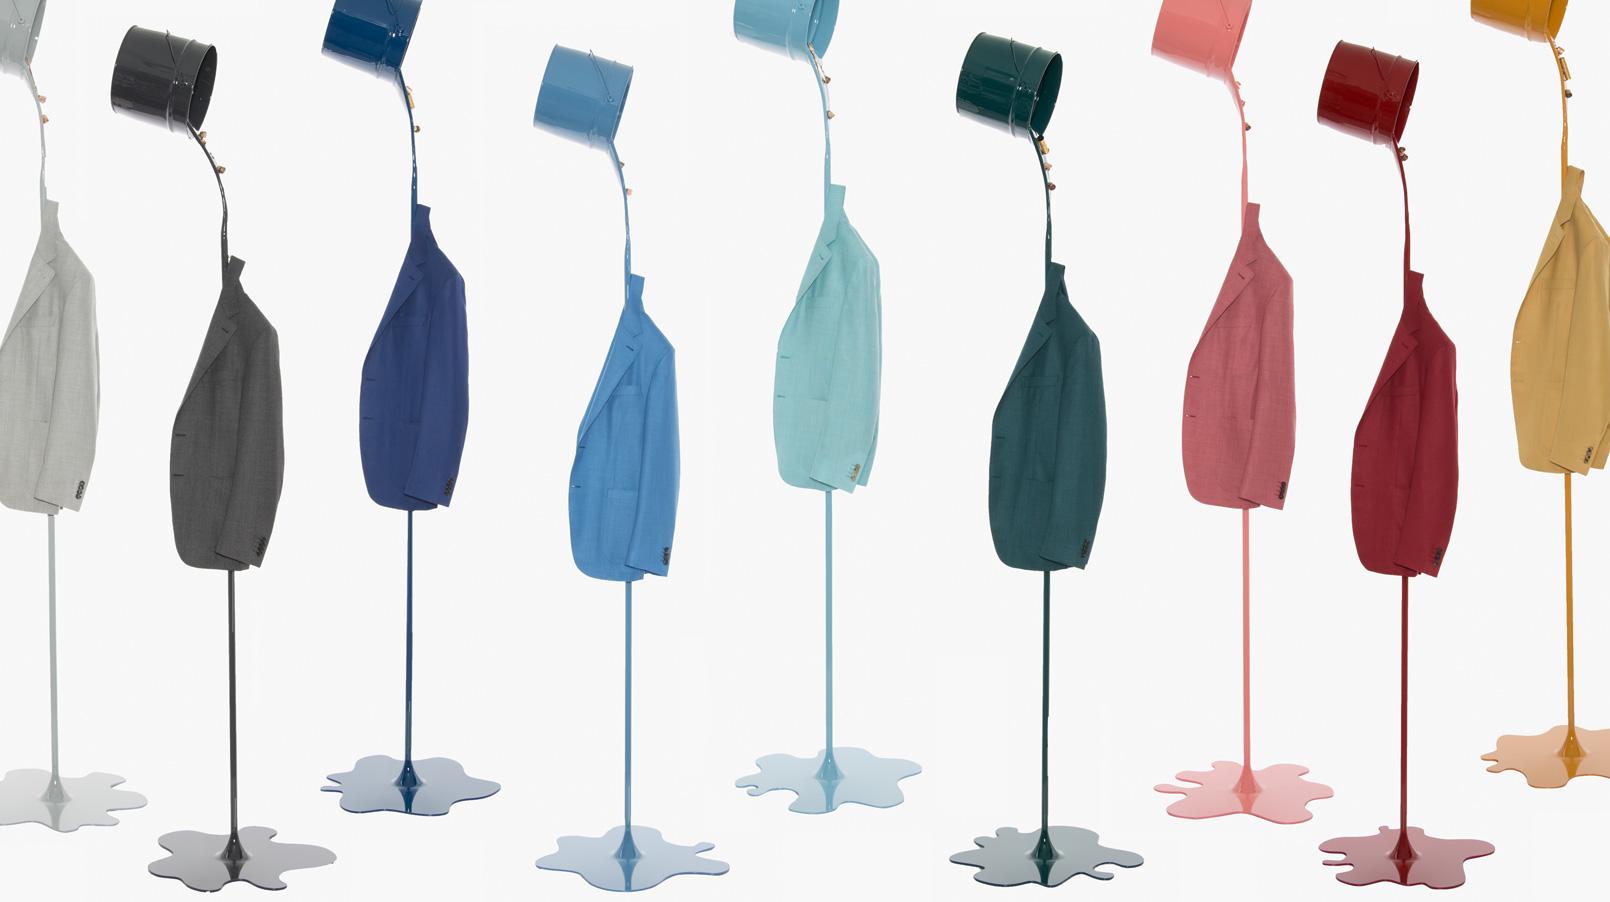 Canali_Kei_Jacket_Menswear_Colors.jpg